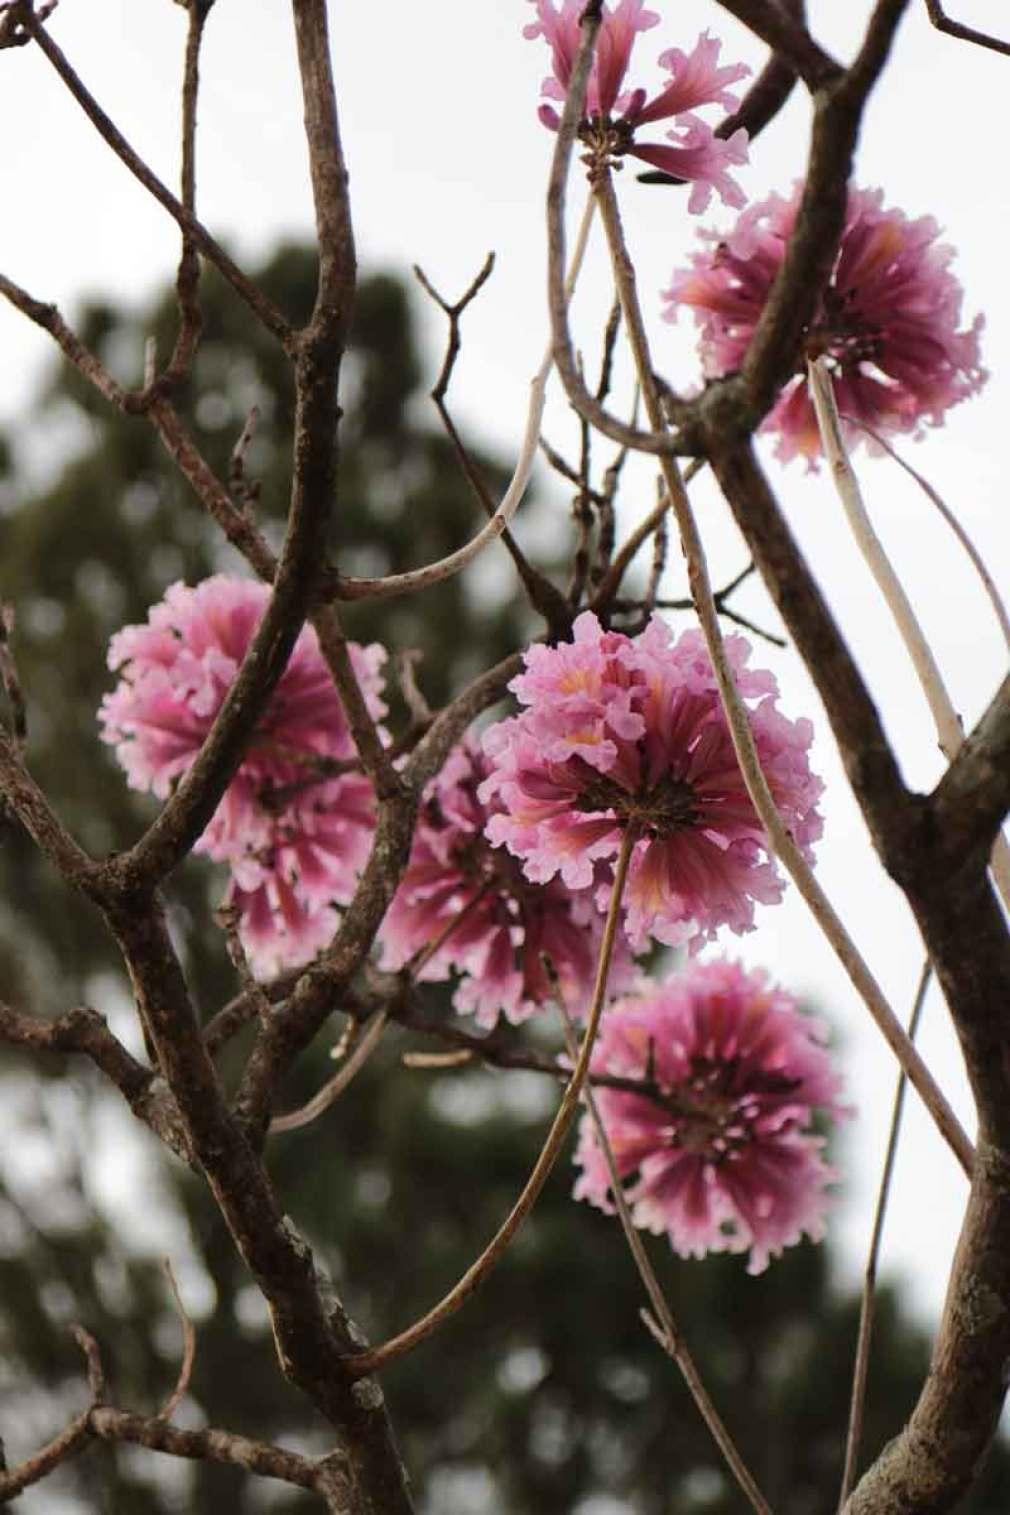 Fotografando o ipê florido